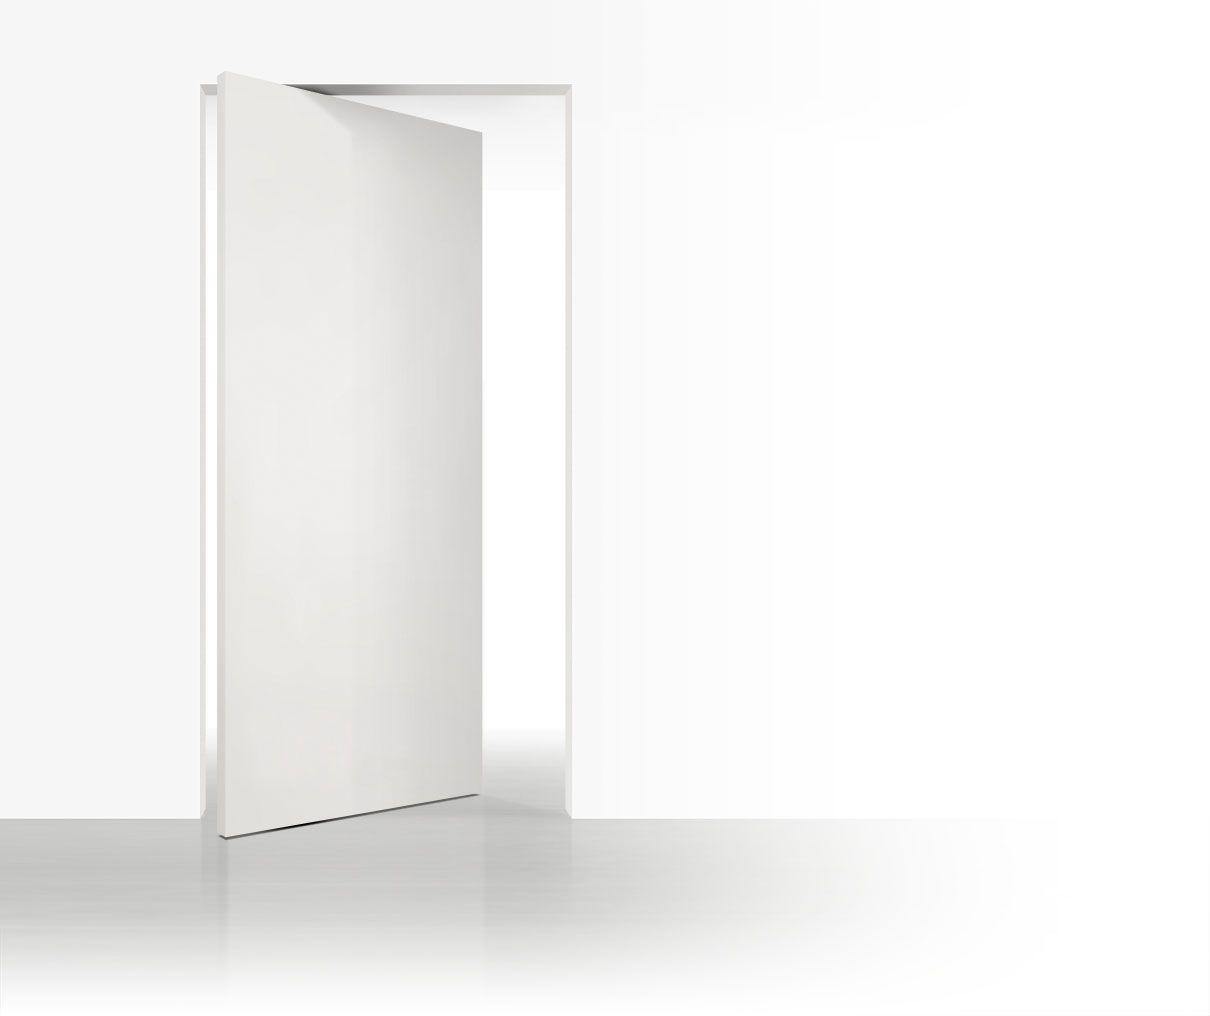 UC Doors Pivoting (TURN) - Bod\u0027or KTM  sc 1 st  Pinterest & UC Doors Pivoting (TURN) - Bod\u0027or KTM | _____inside | Pinterest ...